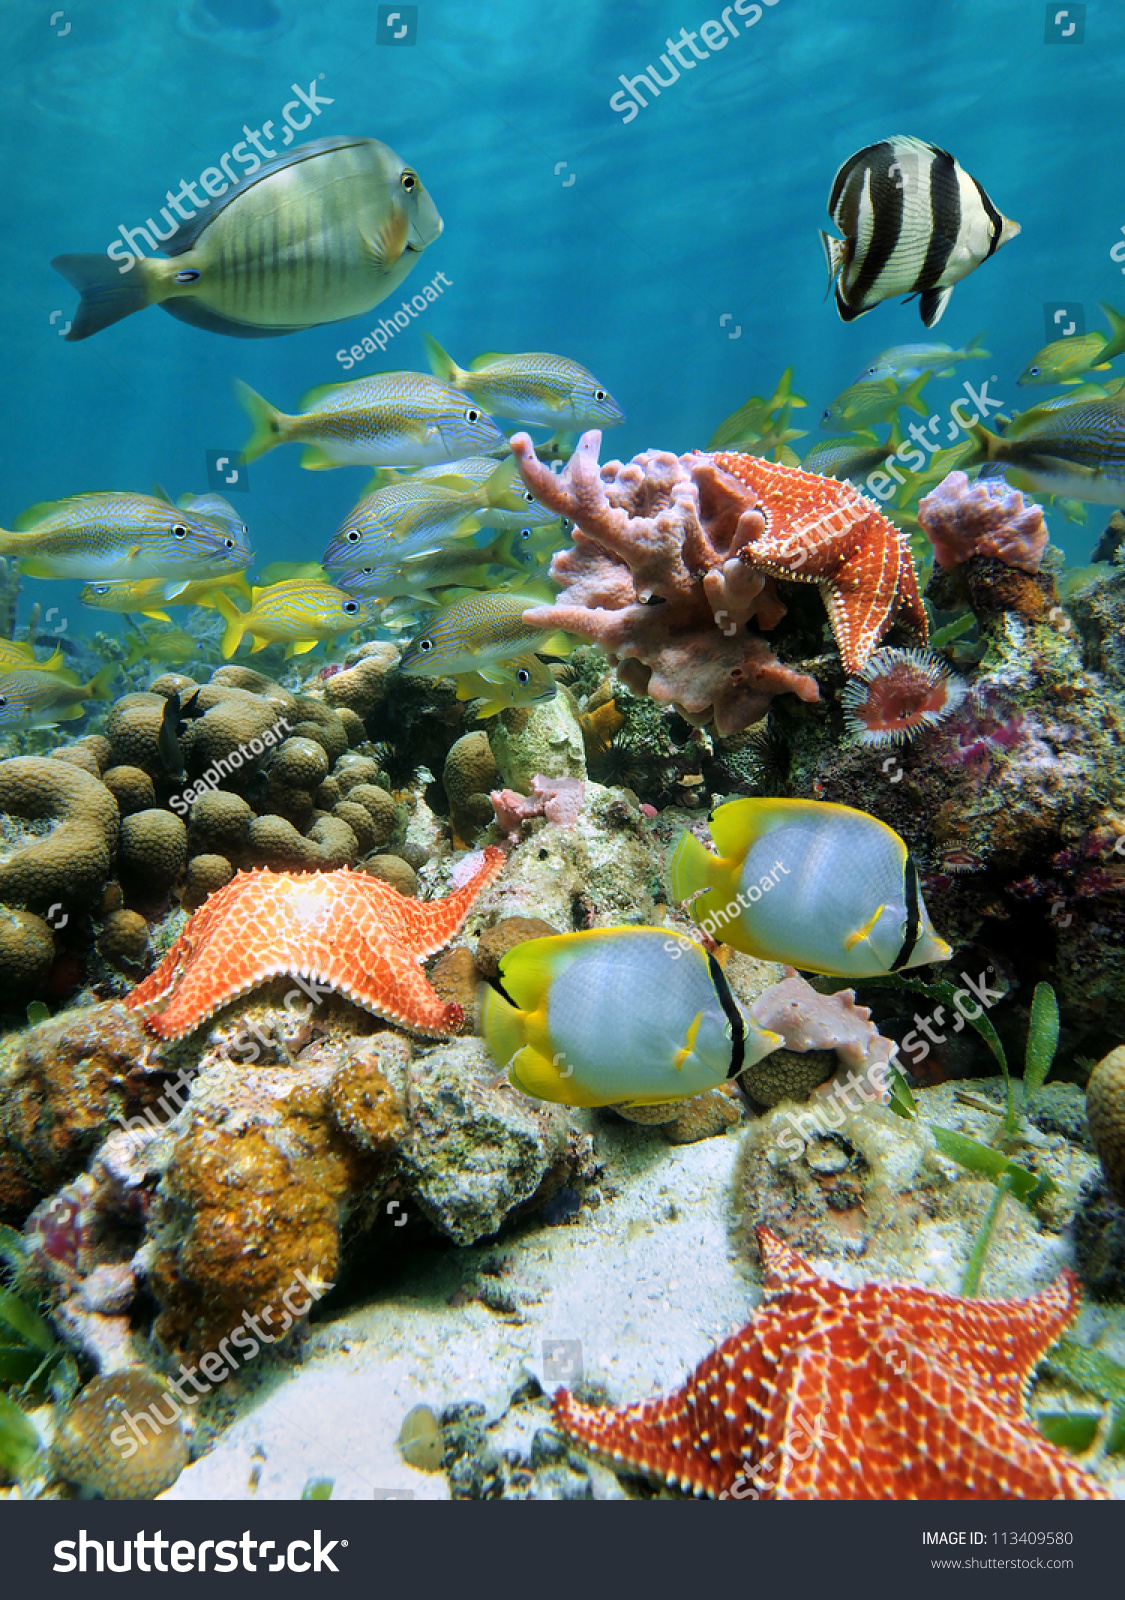 Colorful Underwater Marine Life Stock Photo - Image of ... |Colorful Underwater Life